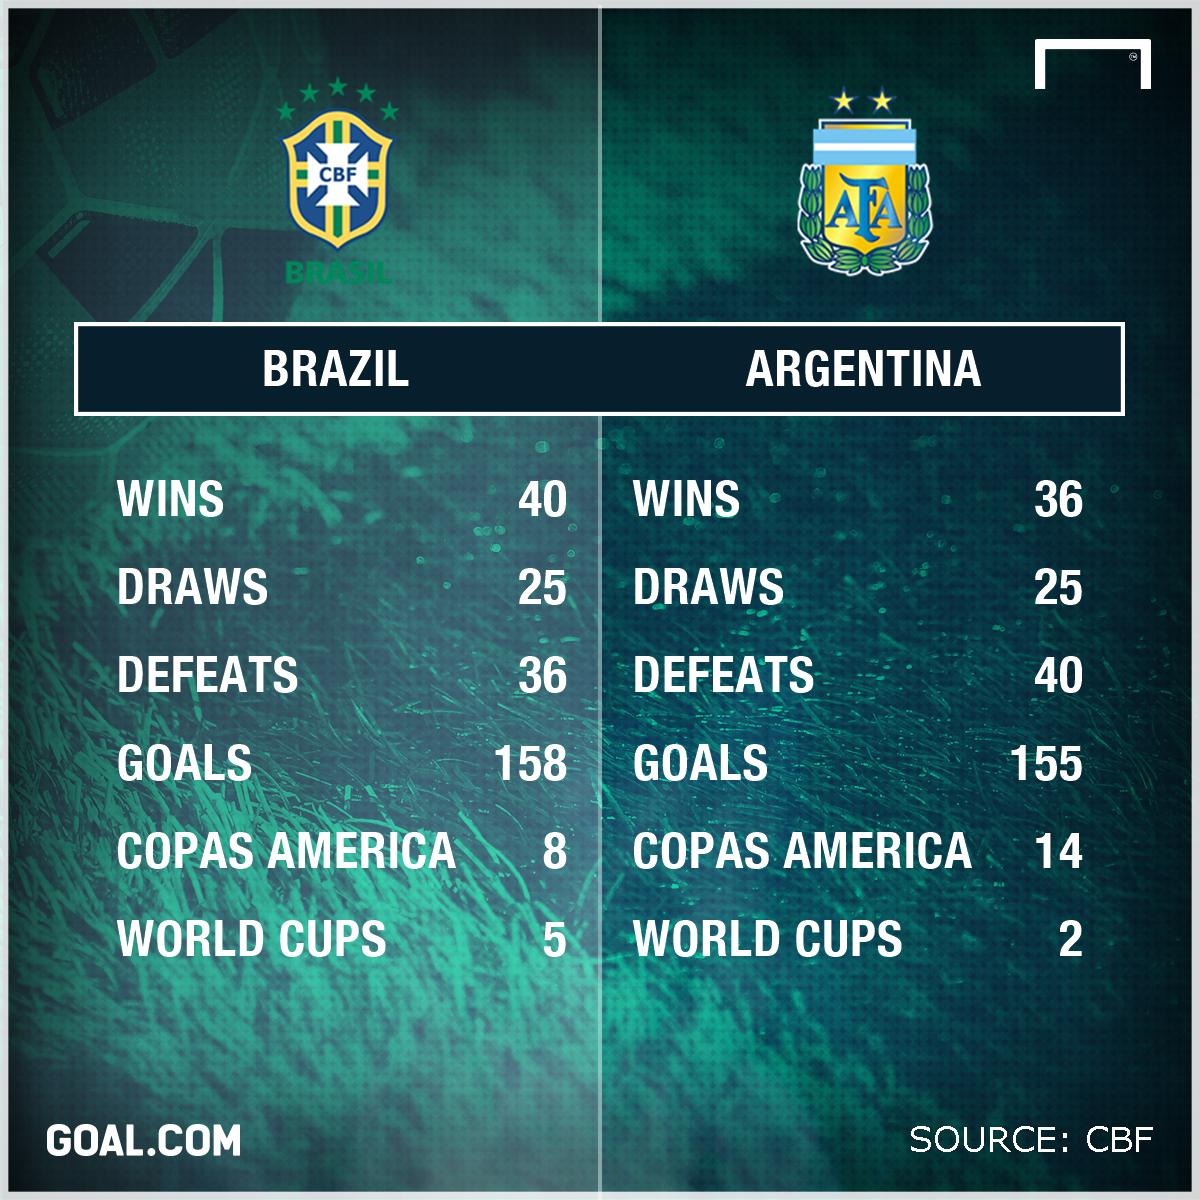 argentina vs brazil - photo #36